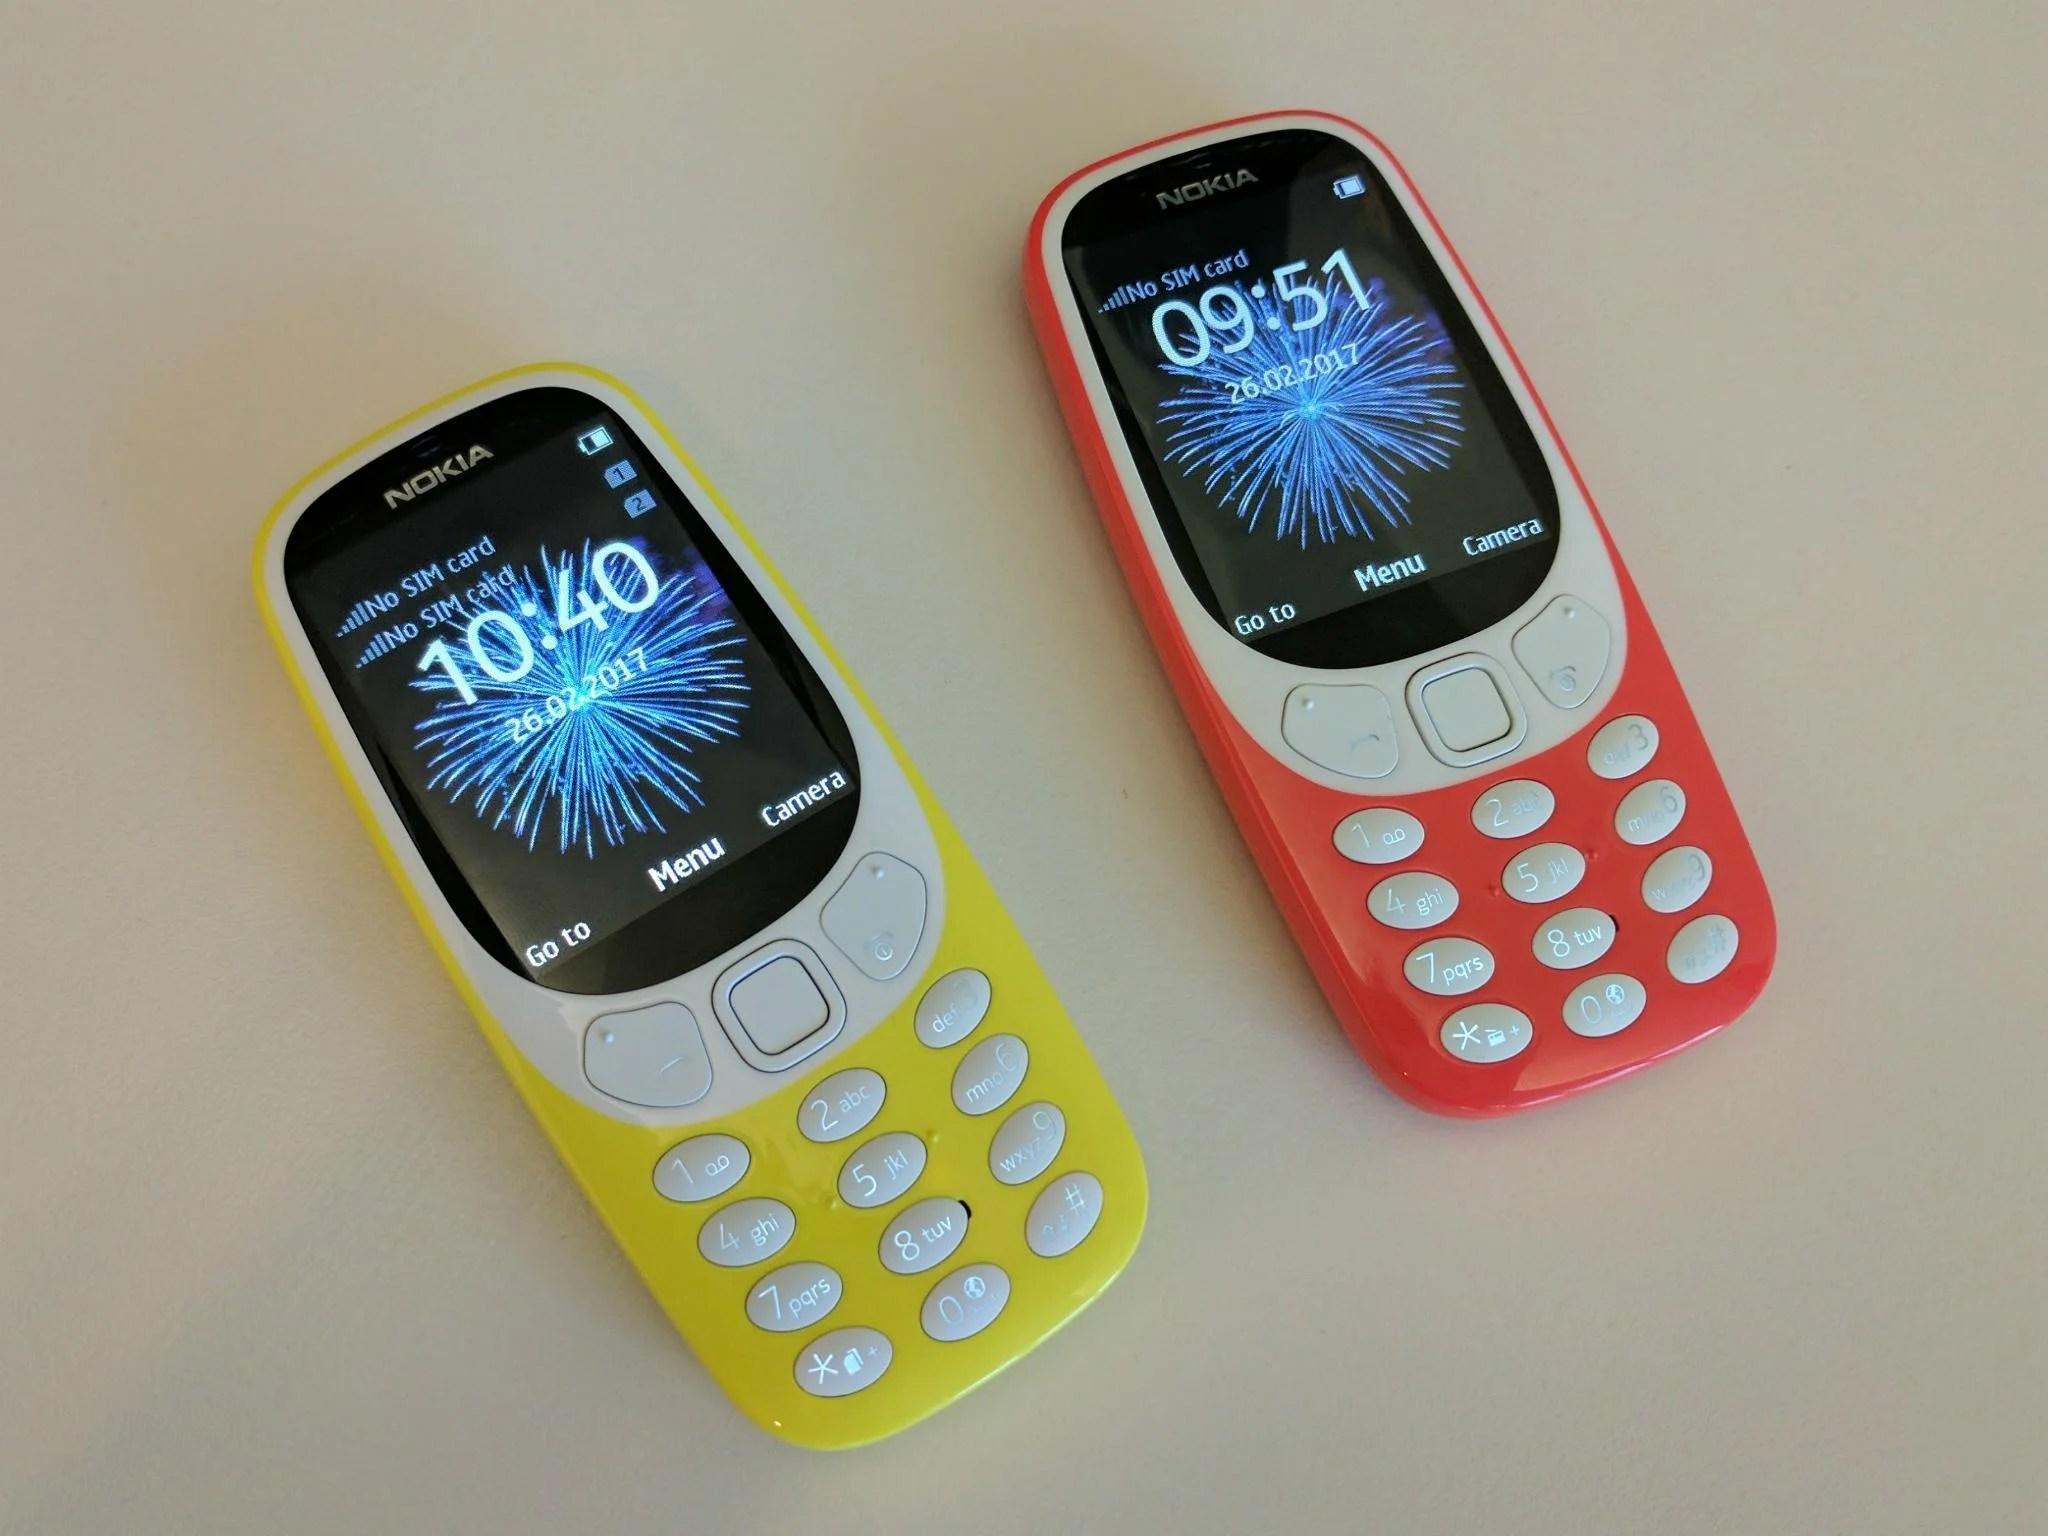 Now Phones 2000